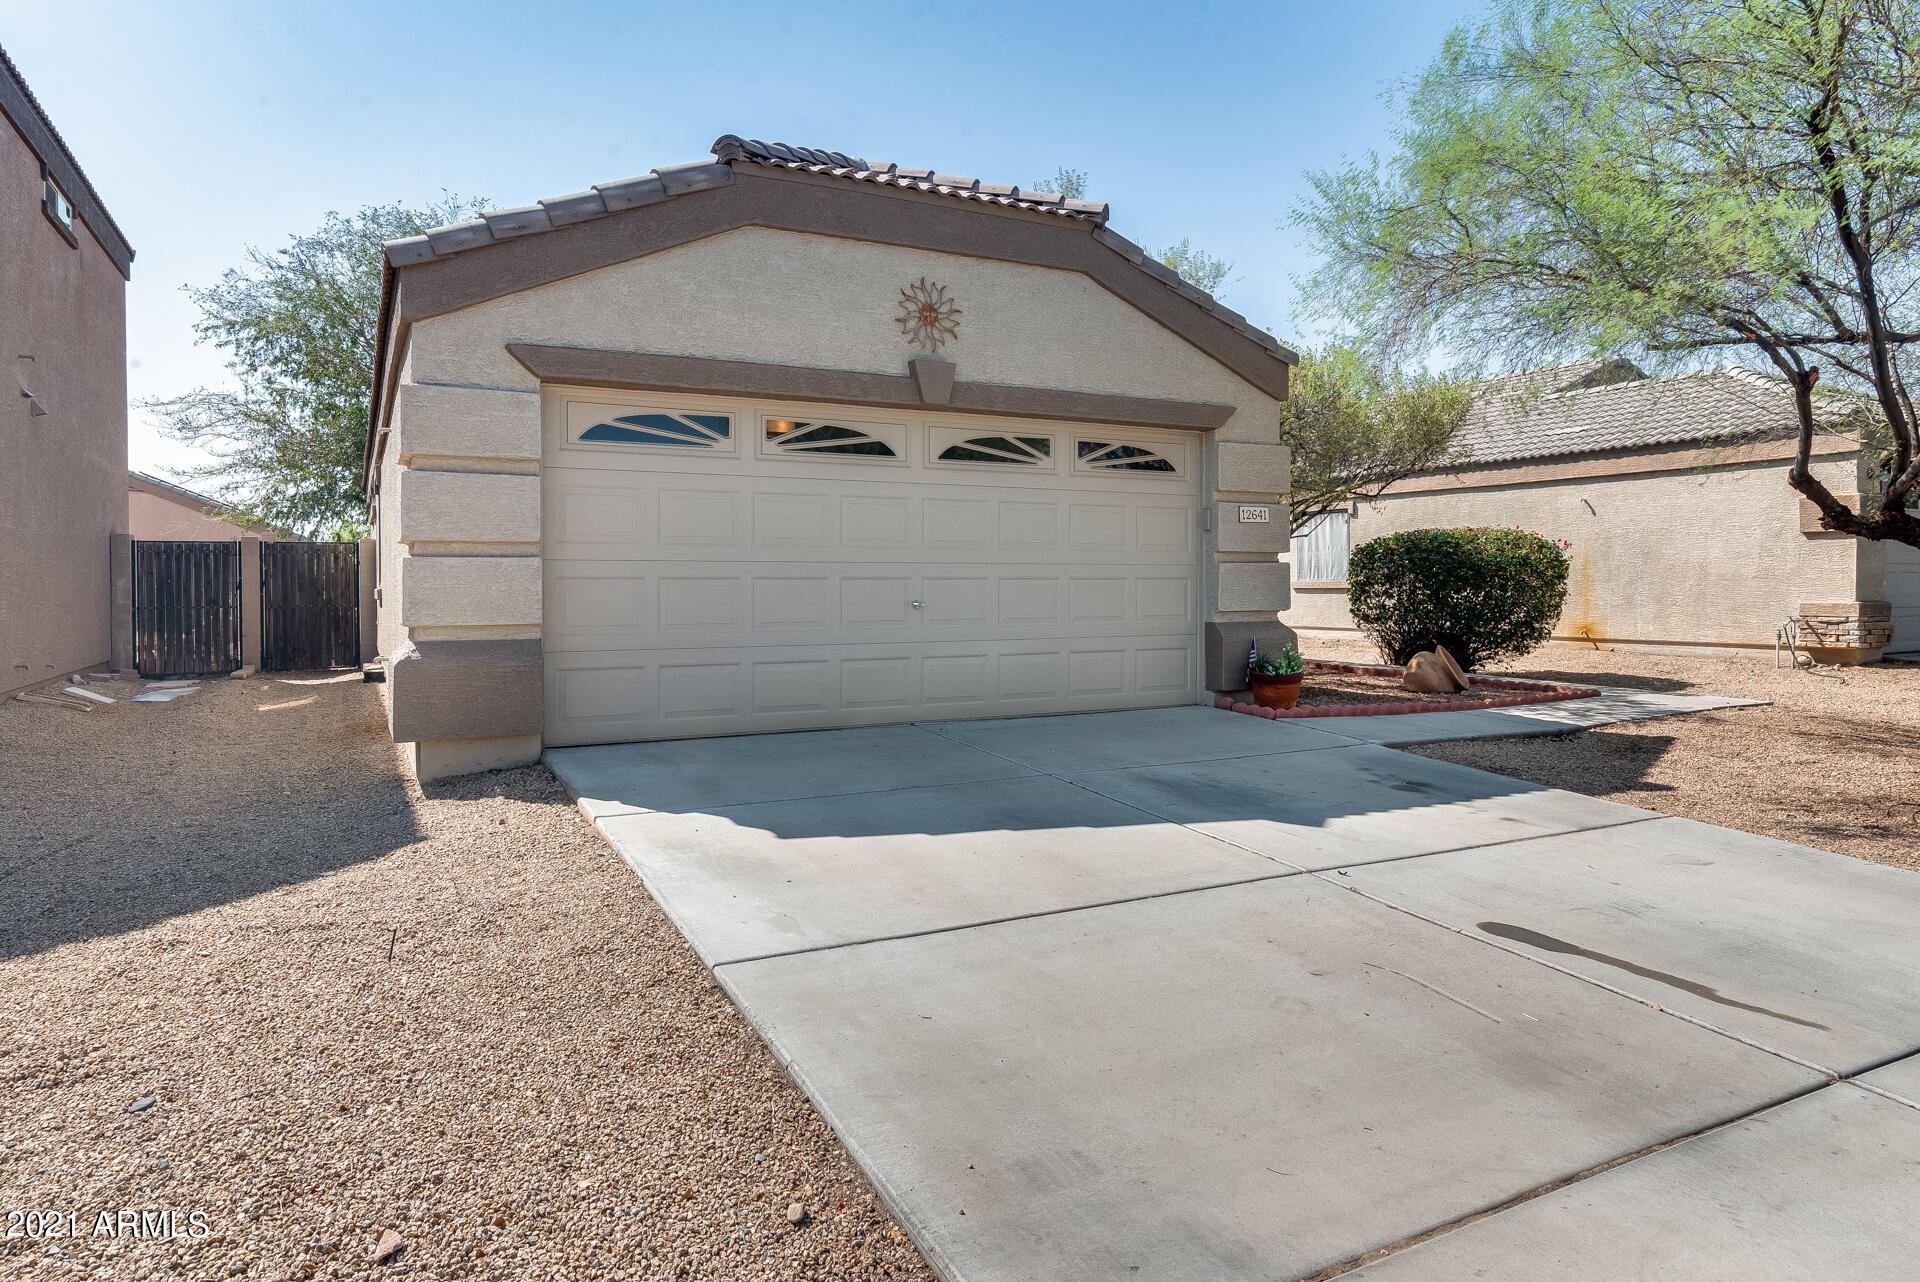 Photo of 12641 W WILLOW Avenue, El Mirage, AZ 85335 (MLS # 6296141)